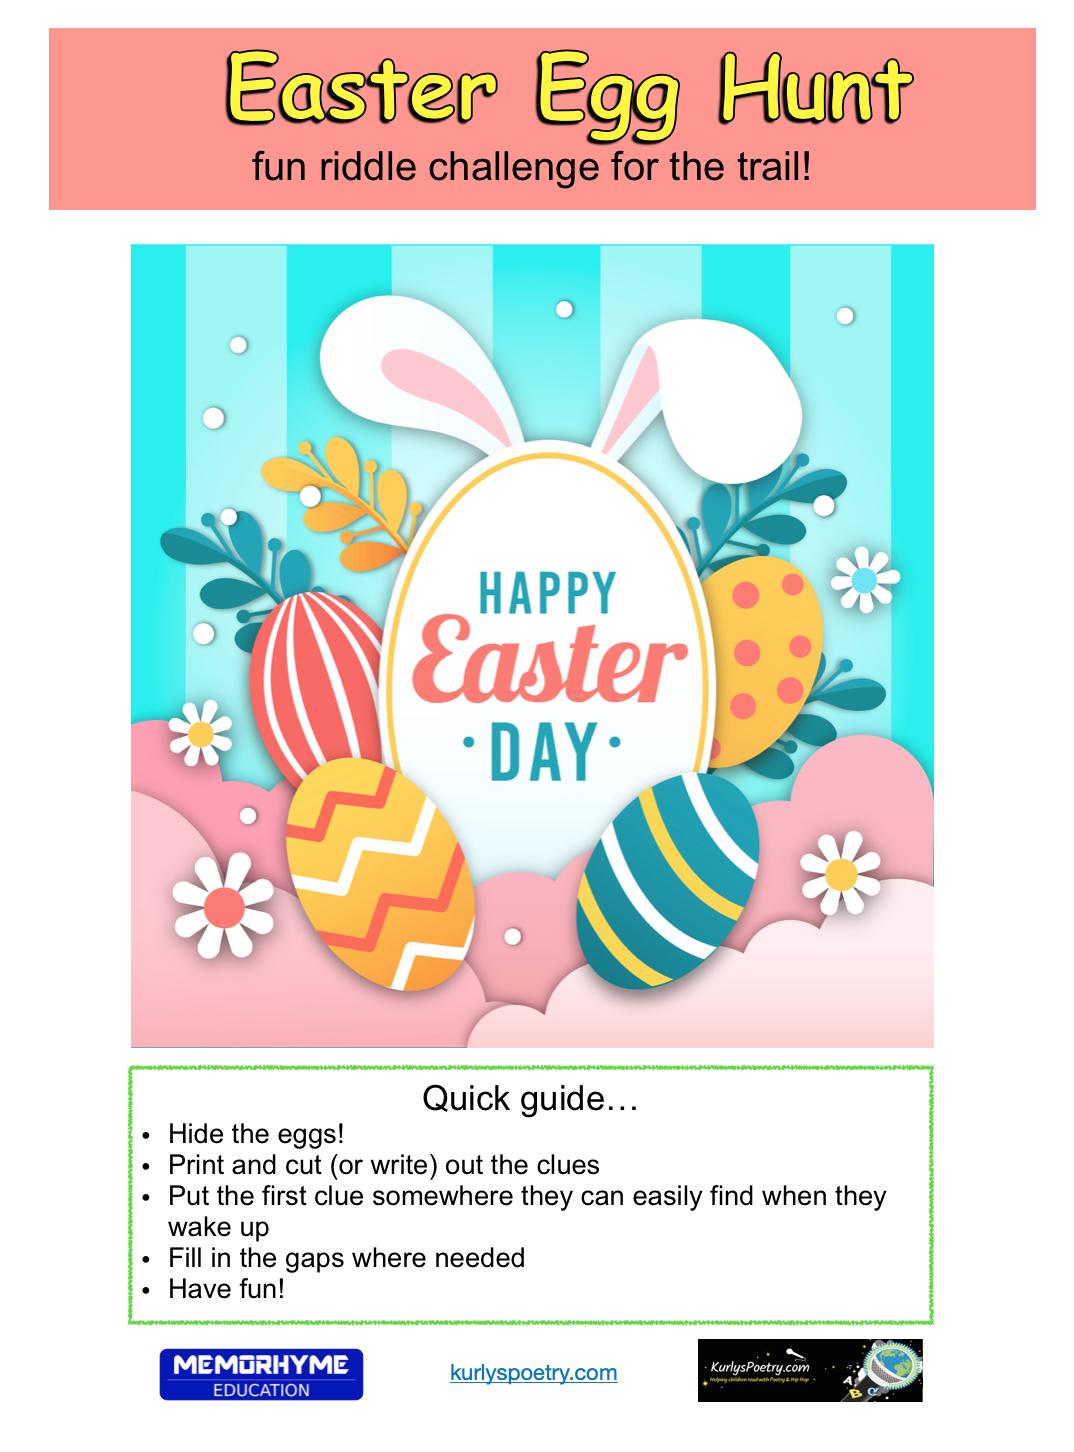 Easter Egg Hunt - Poetry Challenge Trial